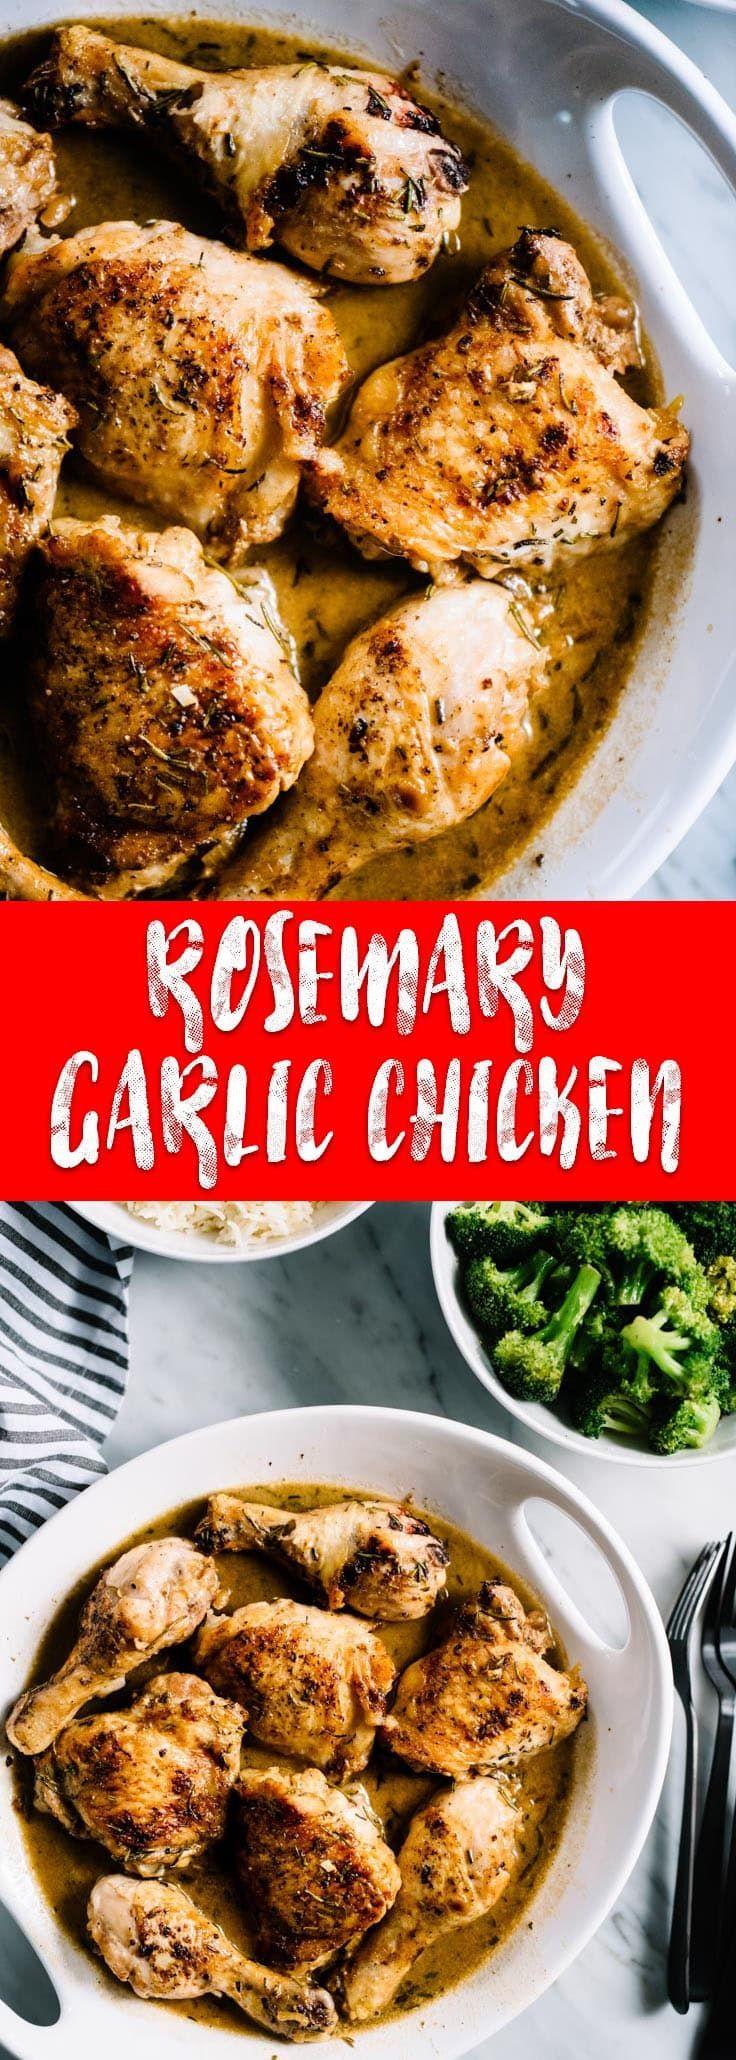 Creamy Rosemary Garlic Chicken Recipe Rosemary Chicken Recipe Rosemary Chicken Baked Garlic Rosemary Chicken